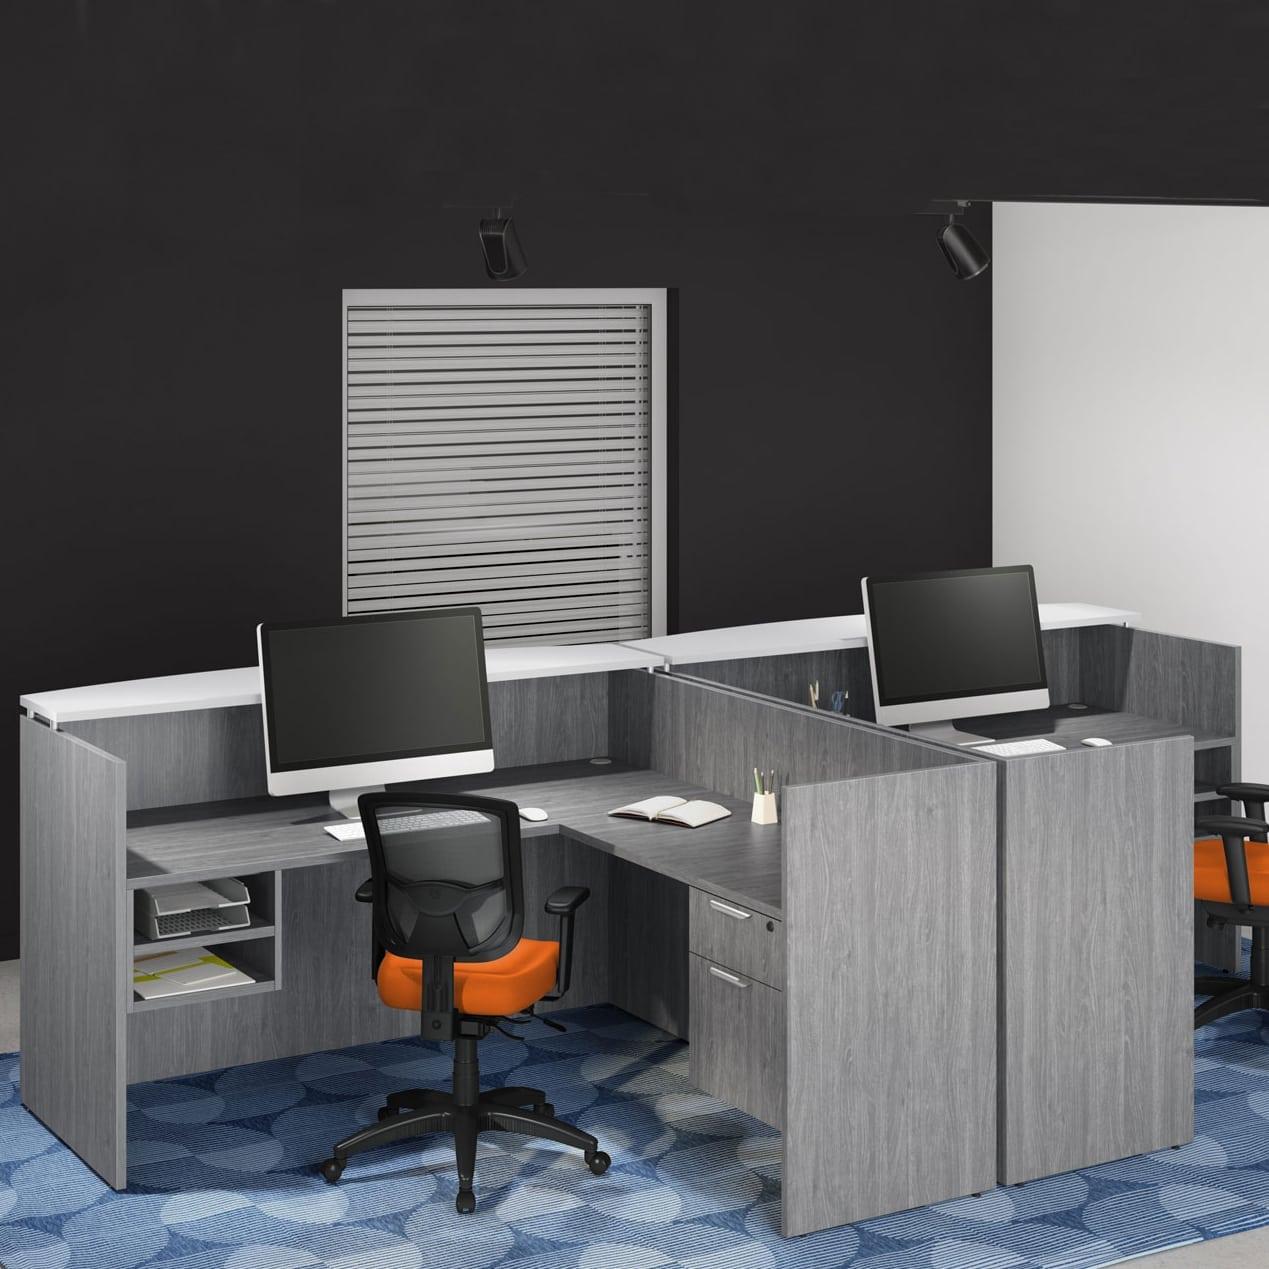 Double Reception Desk Station - Affordable & Stylish